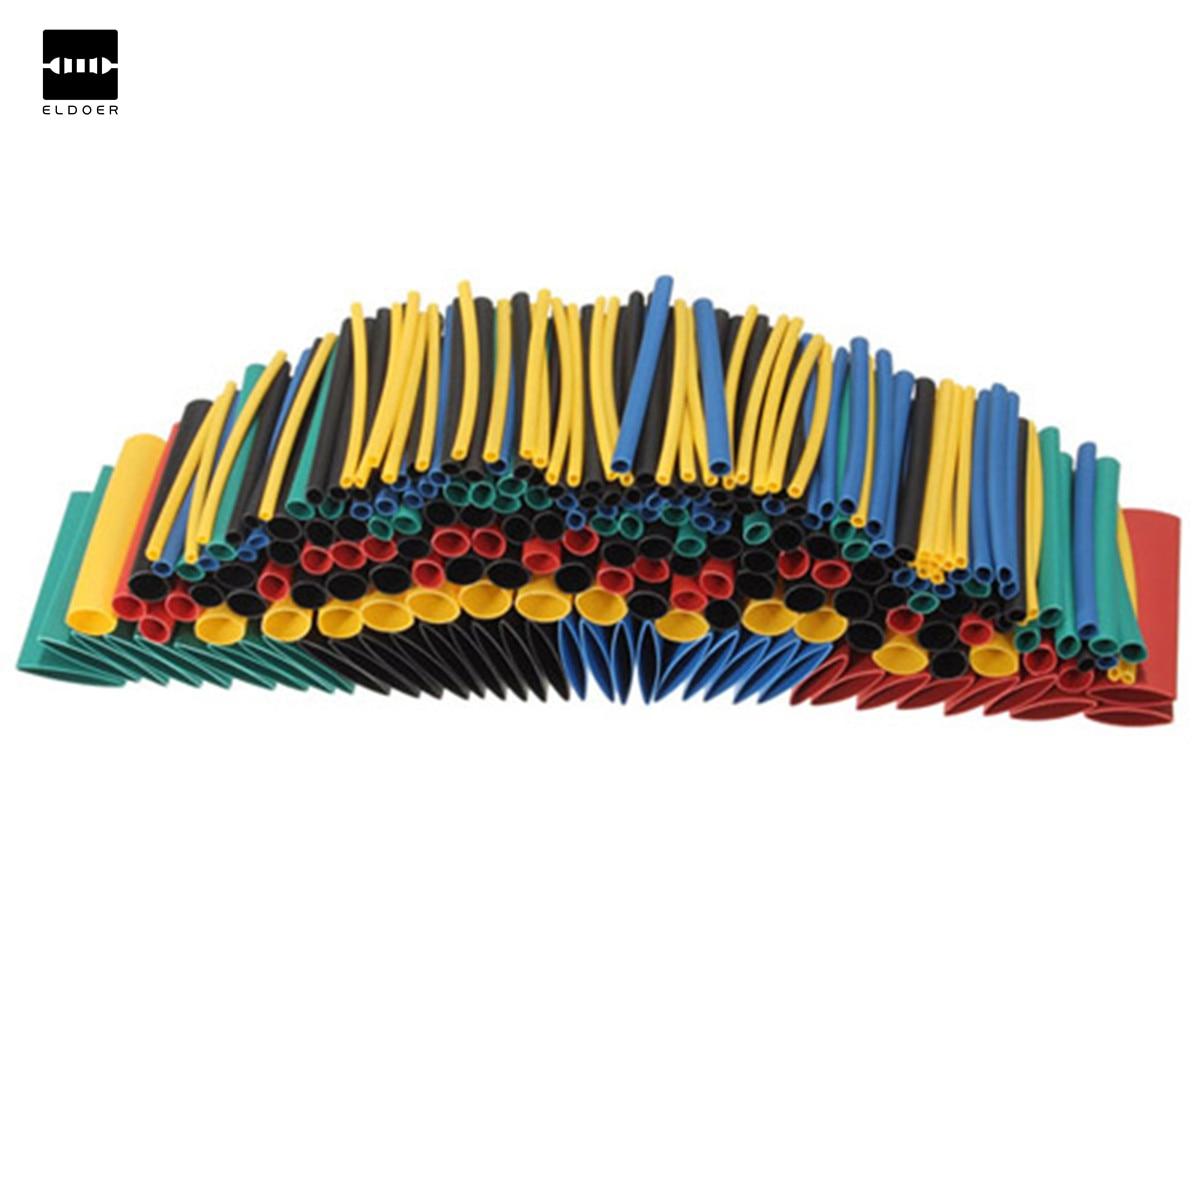 280Pcs 8 Sizes Multi Color 2:1 Heat Shrink Tubing Tube Sleeving Wrap Kit RSFR-H Heatshrink Tubing Yellow Blue Black Green Red